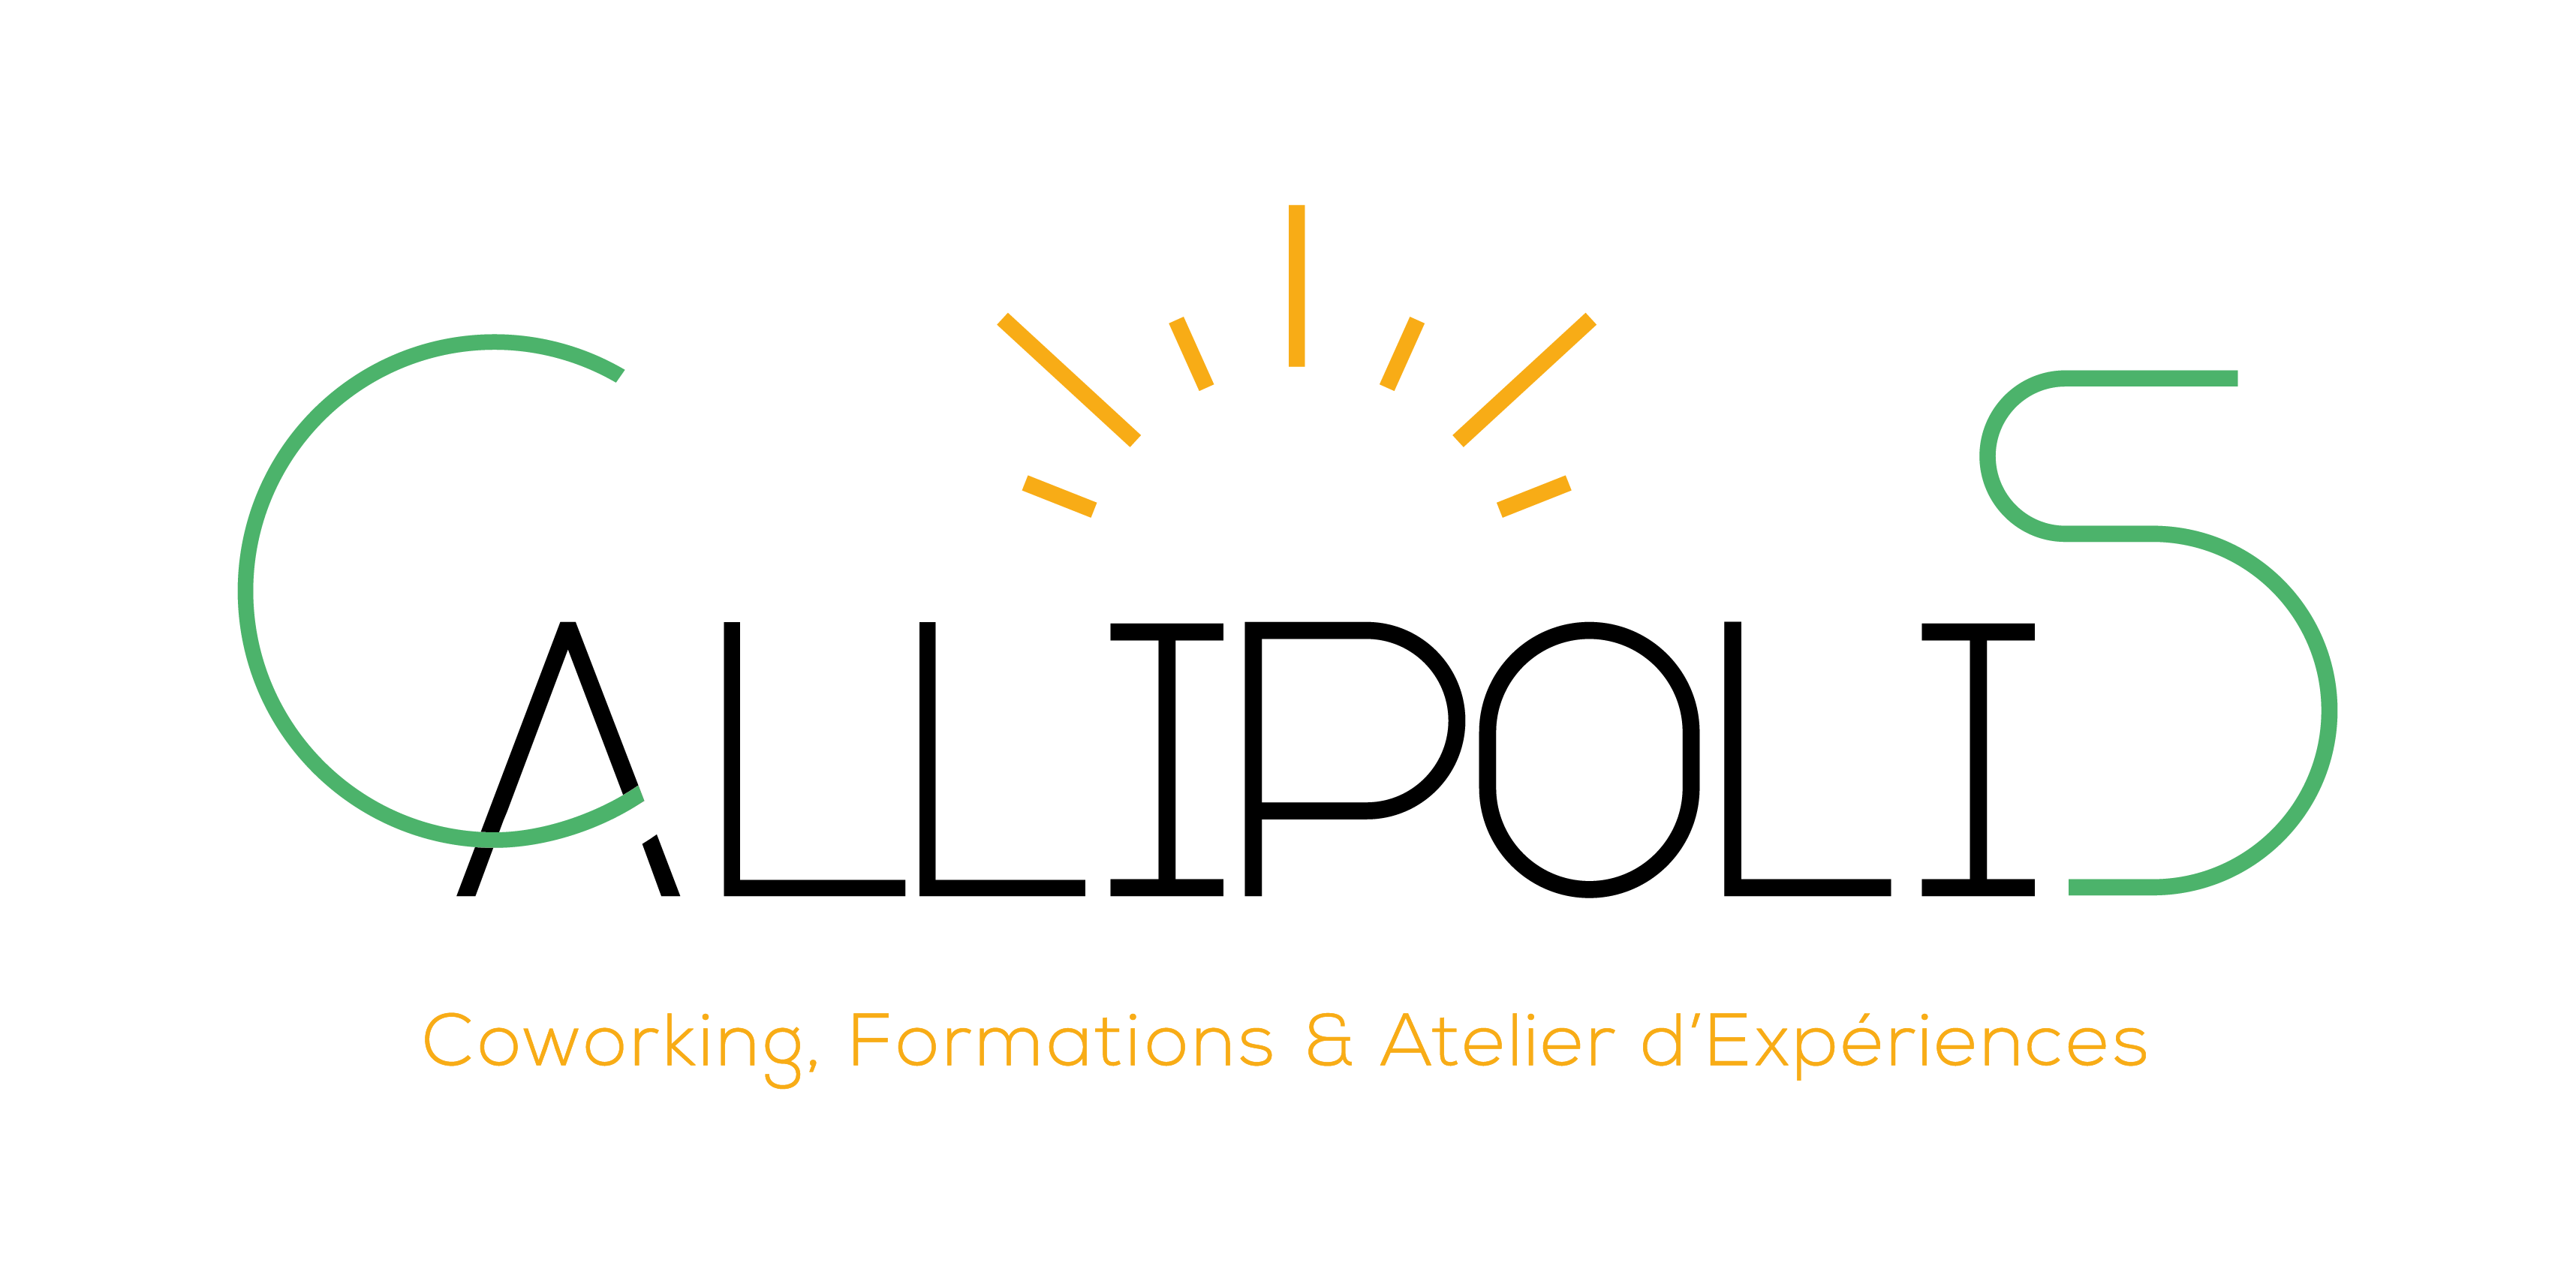 Espace Callipolis